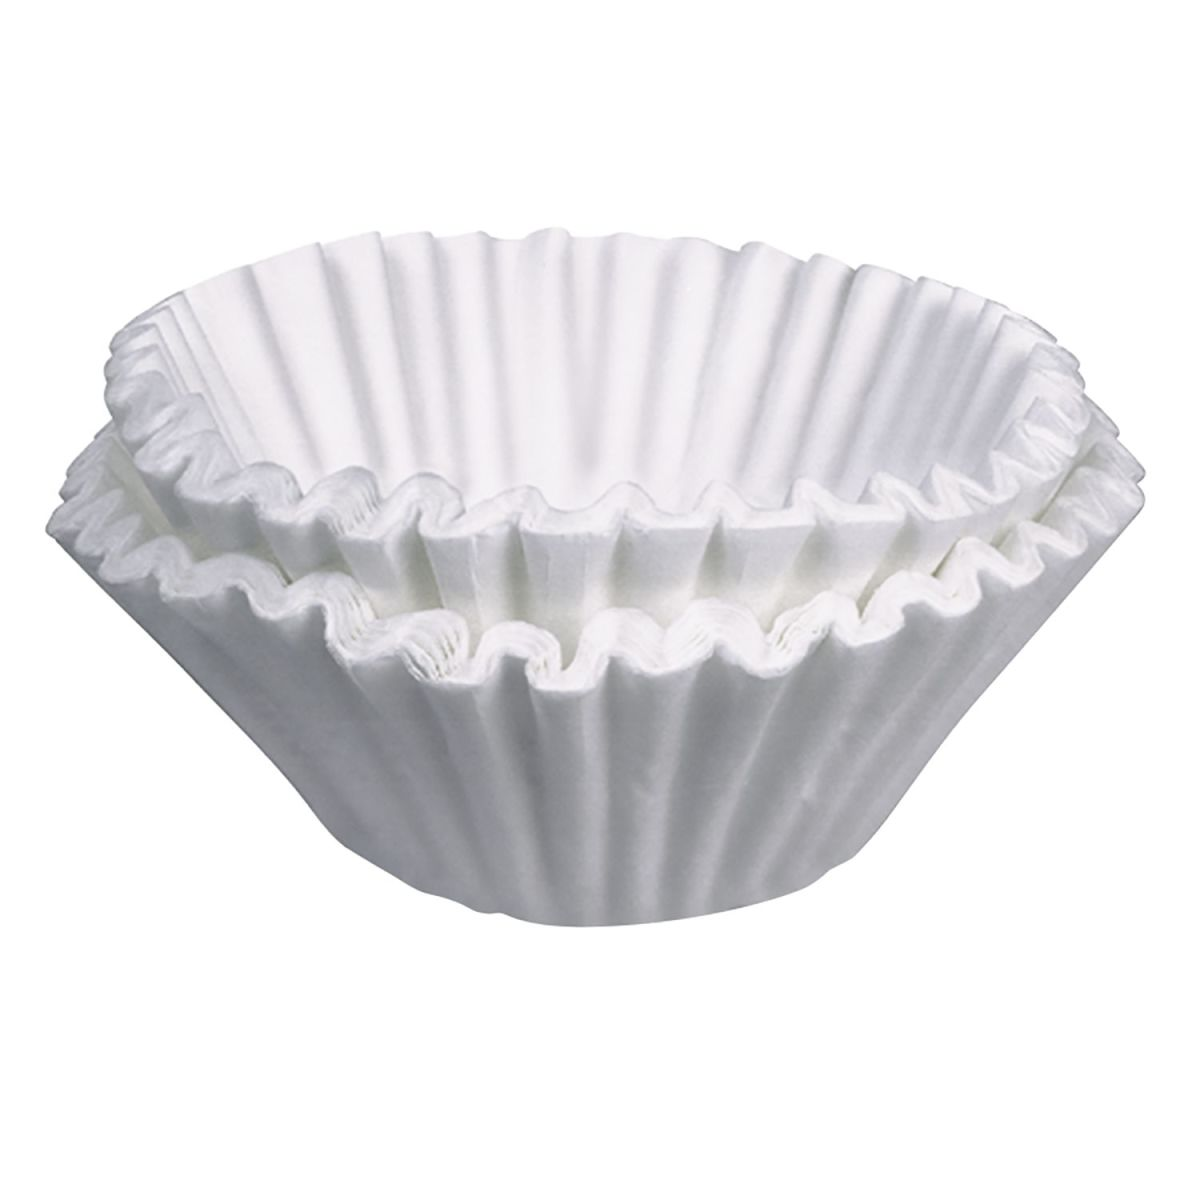 Urn - 6Gal (22.7L) Paper Filters 250/cs